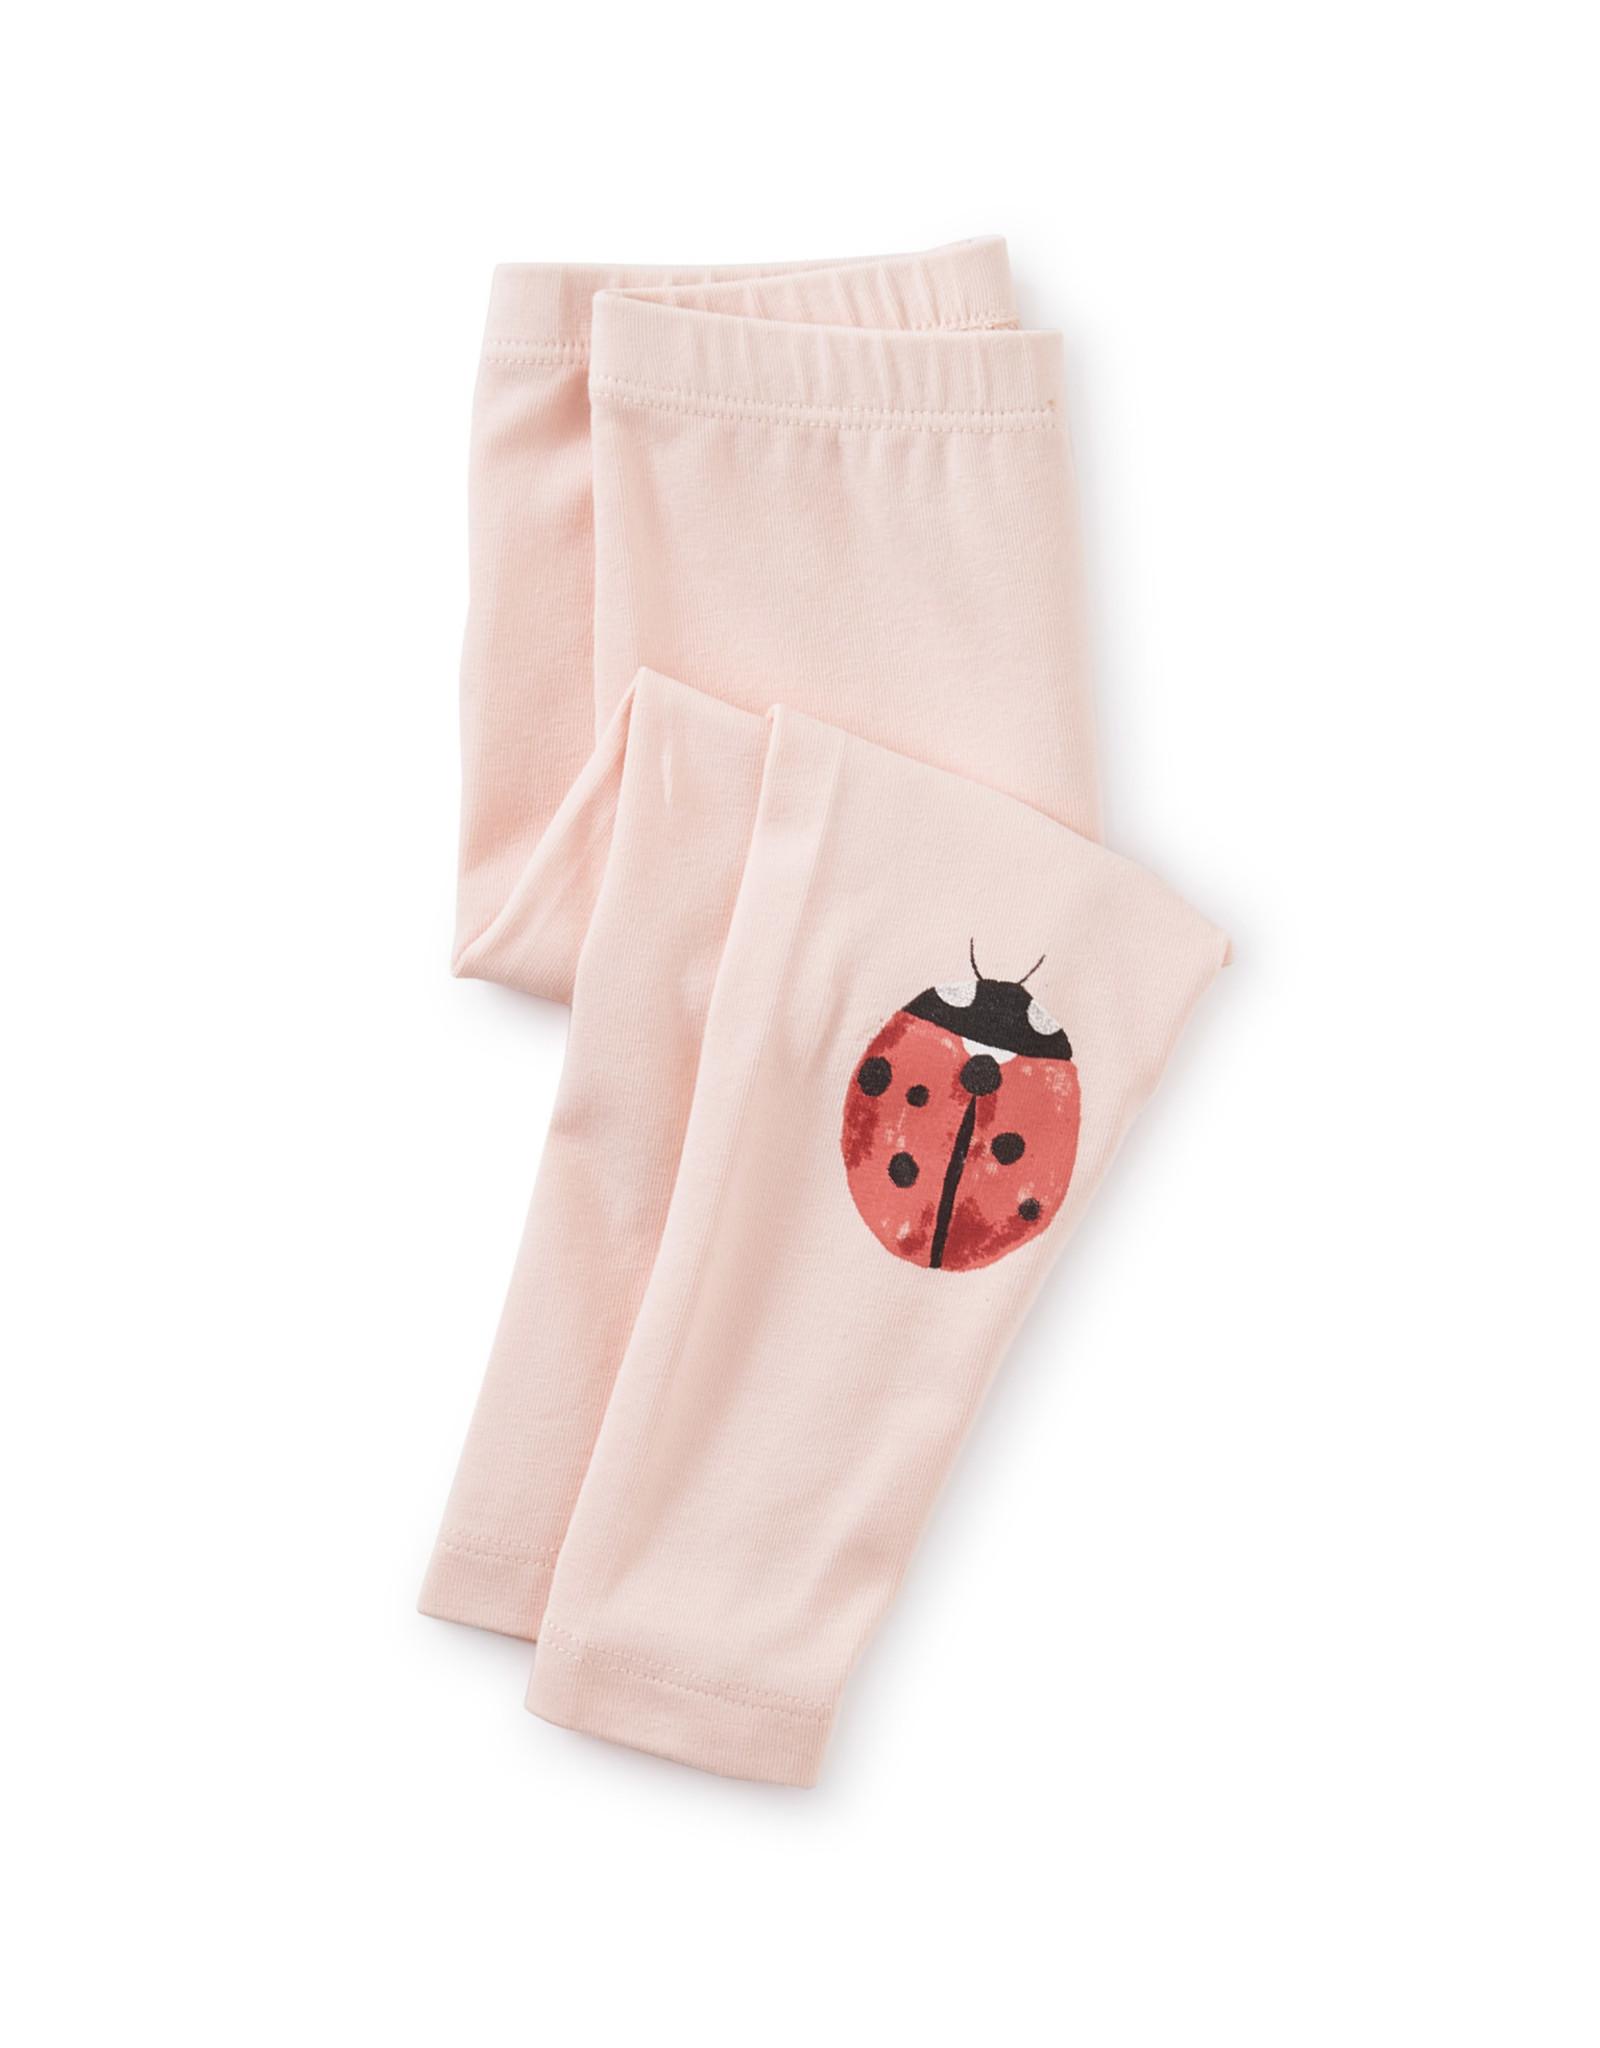 Tea Baby Leggings, Pink Salt with Ladybug Graphic